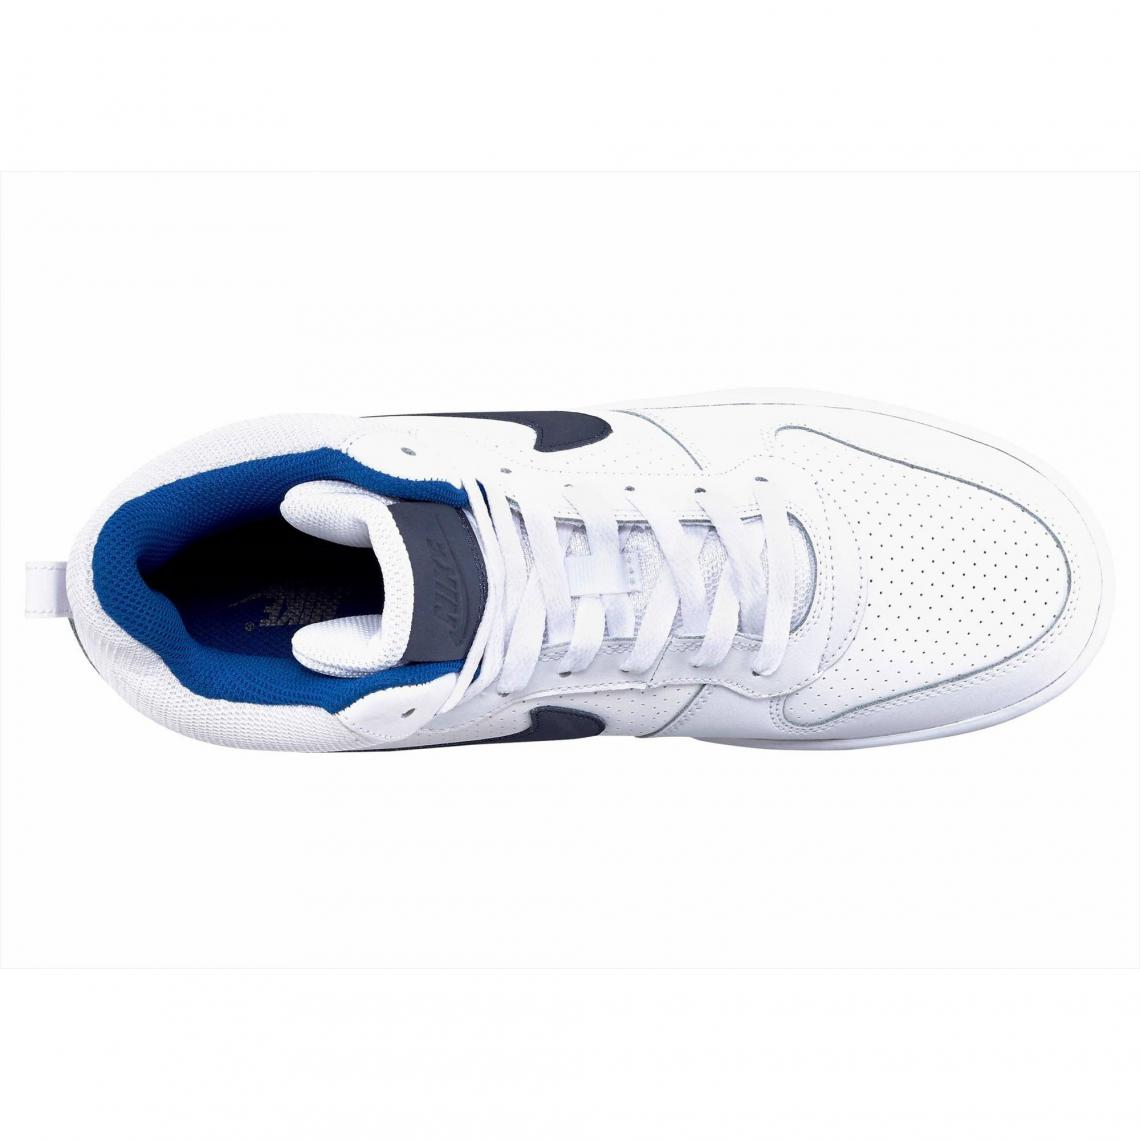 huge discount b6f20 5a8c6 Nike Court Borough Mid chaussure semi-montante homme - Blanc - Bleu Nike